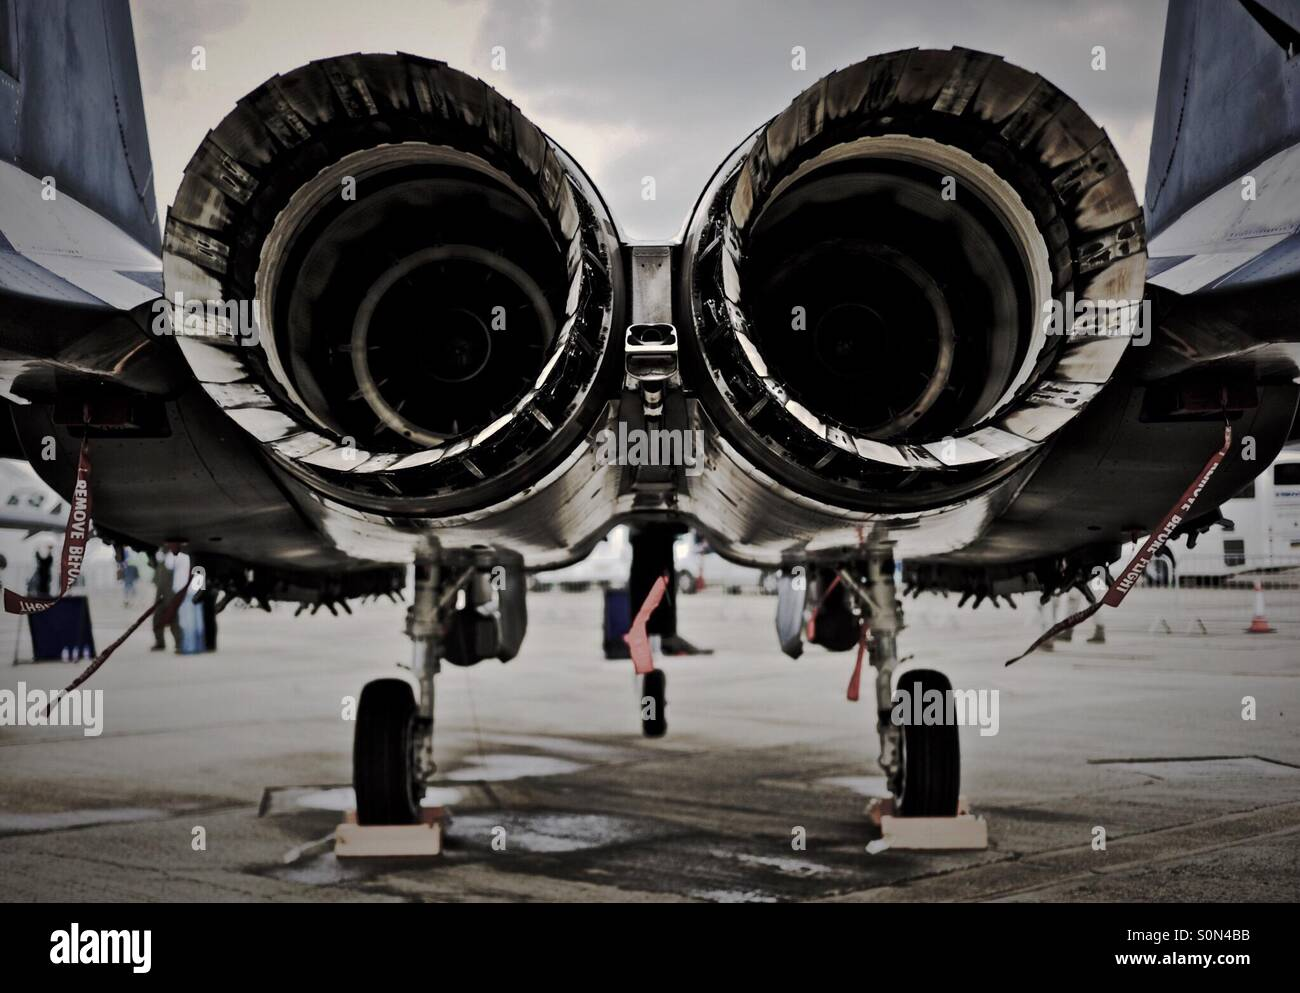 Thrust. - Stock Image